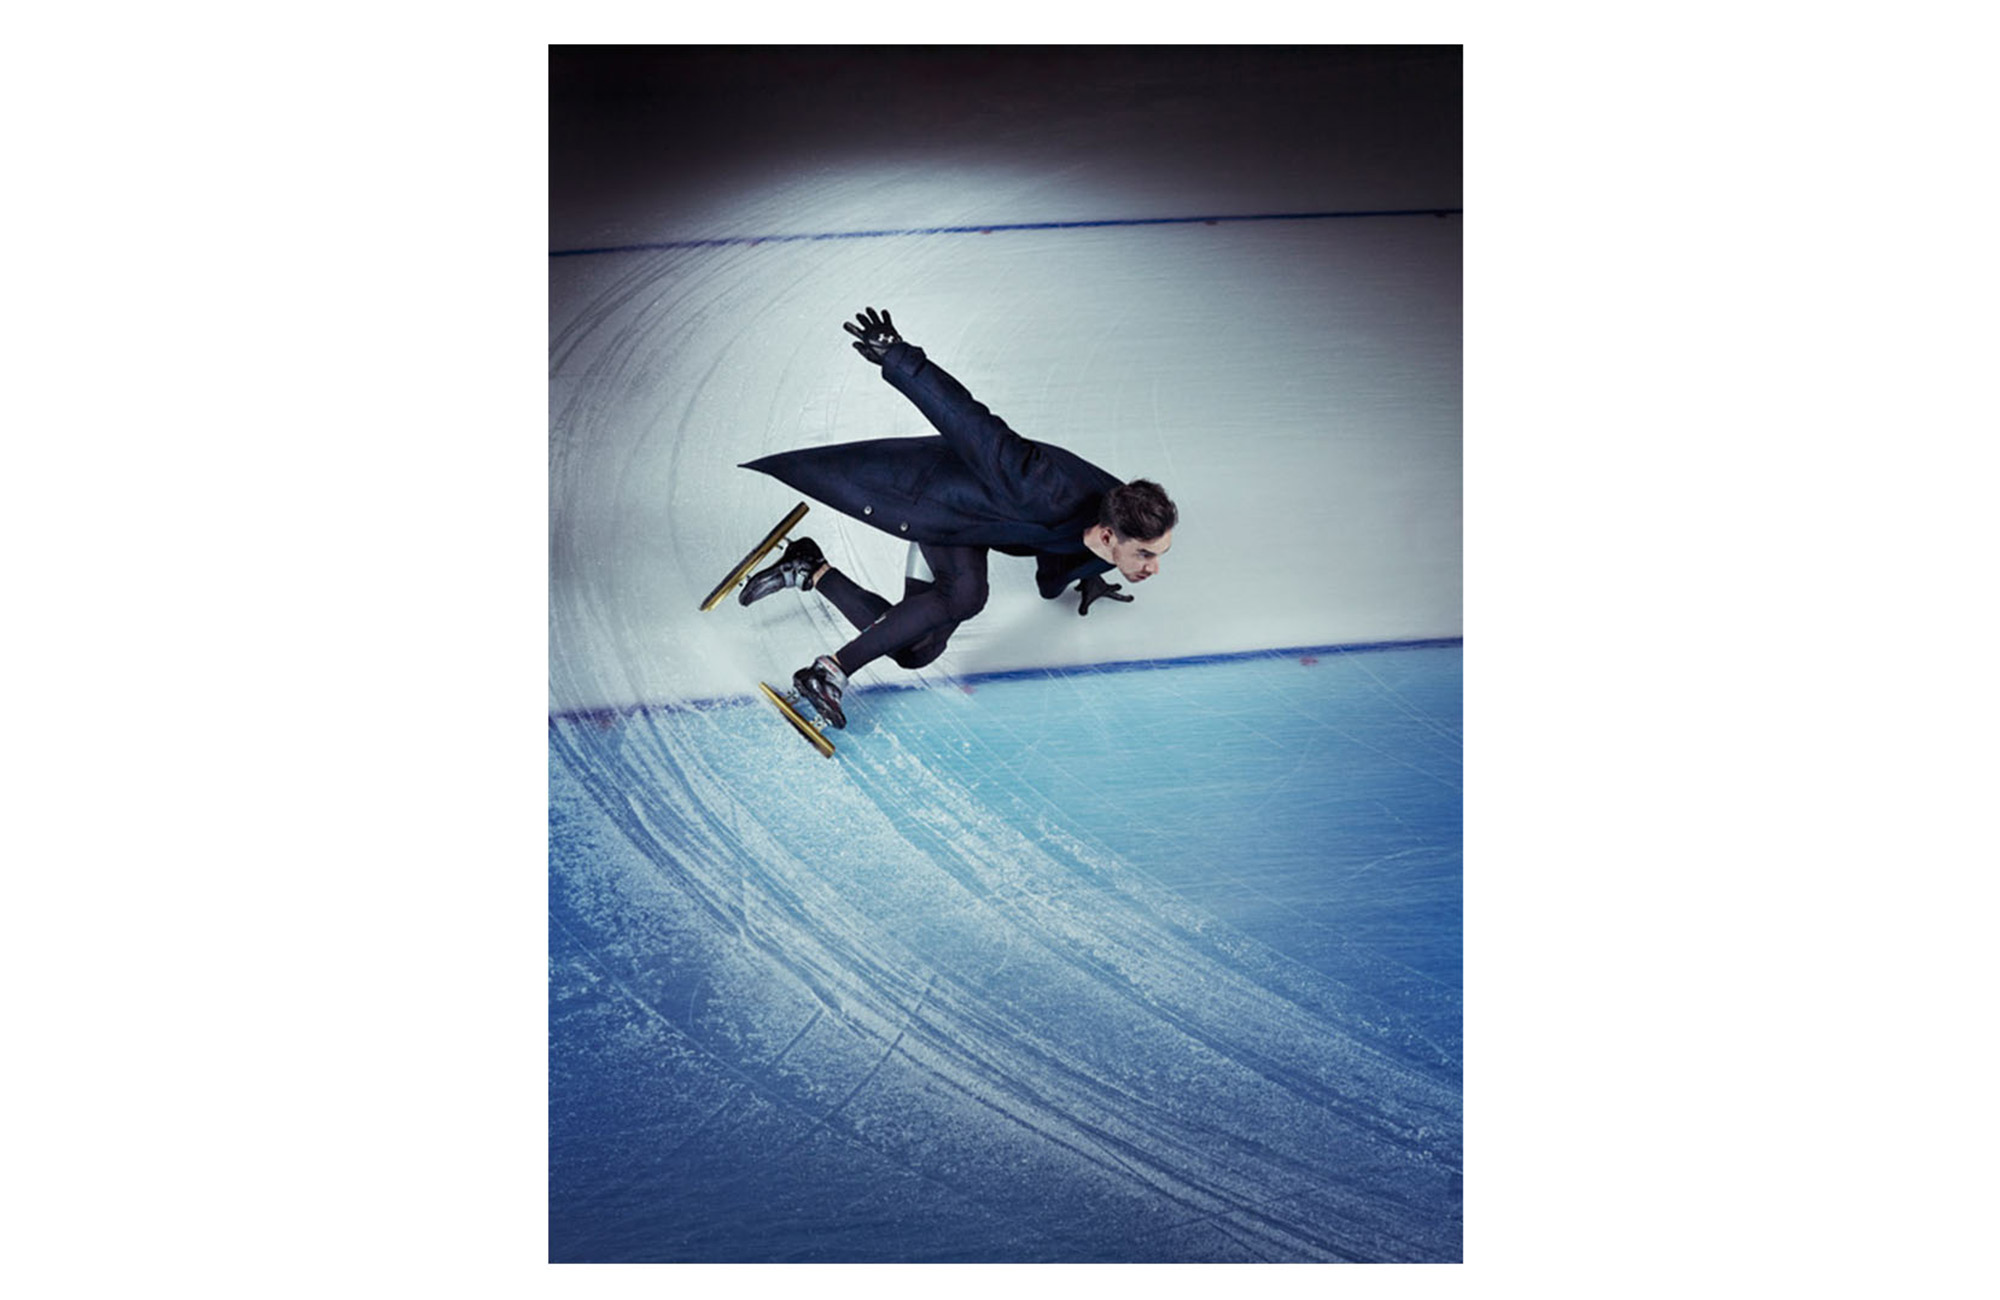 Mens Journal / US Speed Skaters - 1 of 3